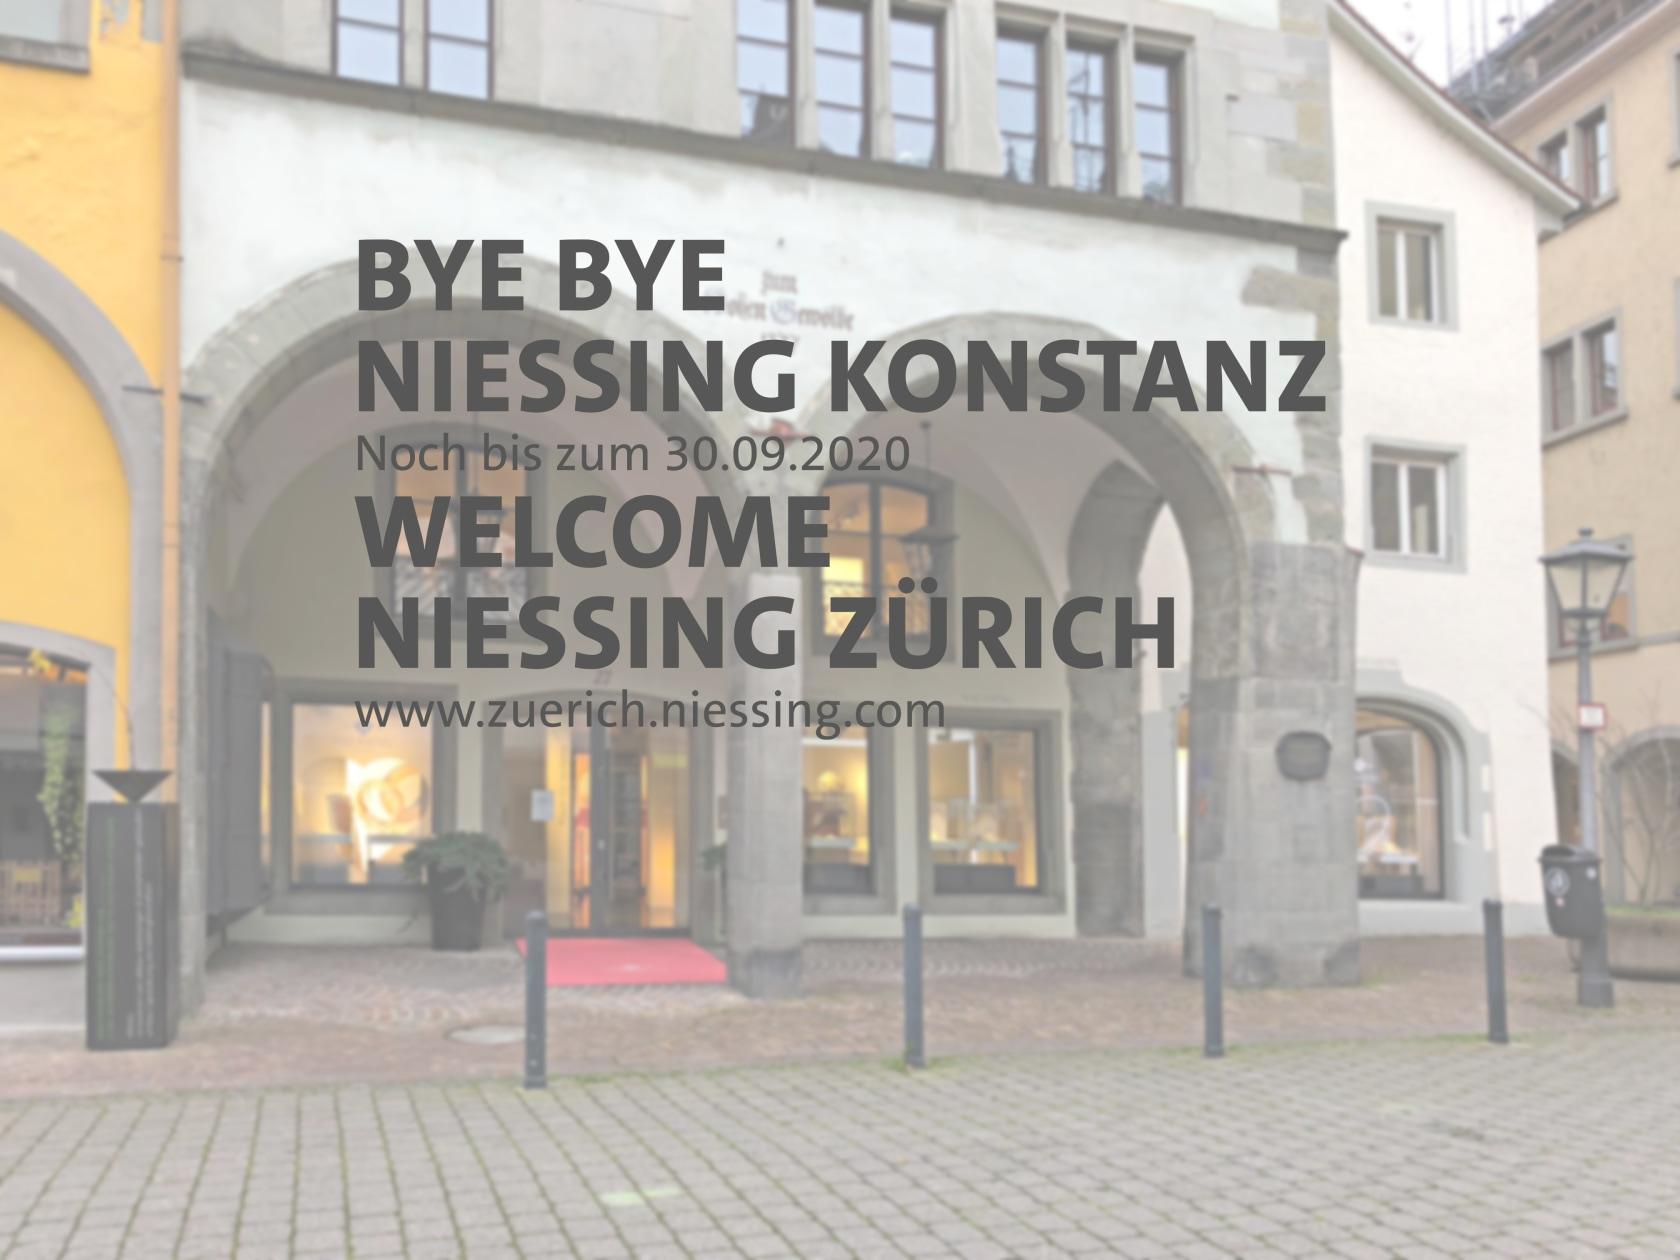 Niessing Store Konstanz